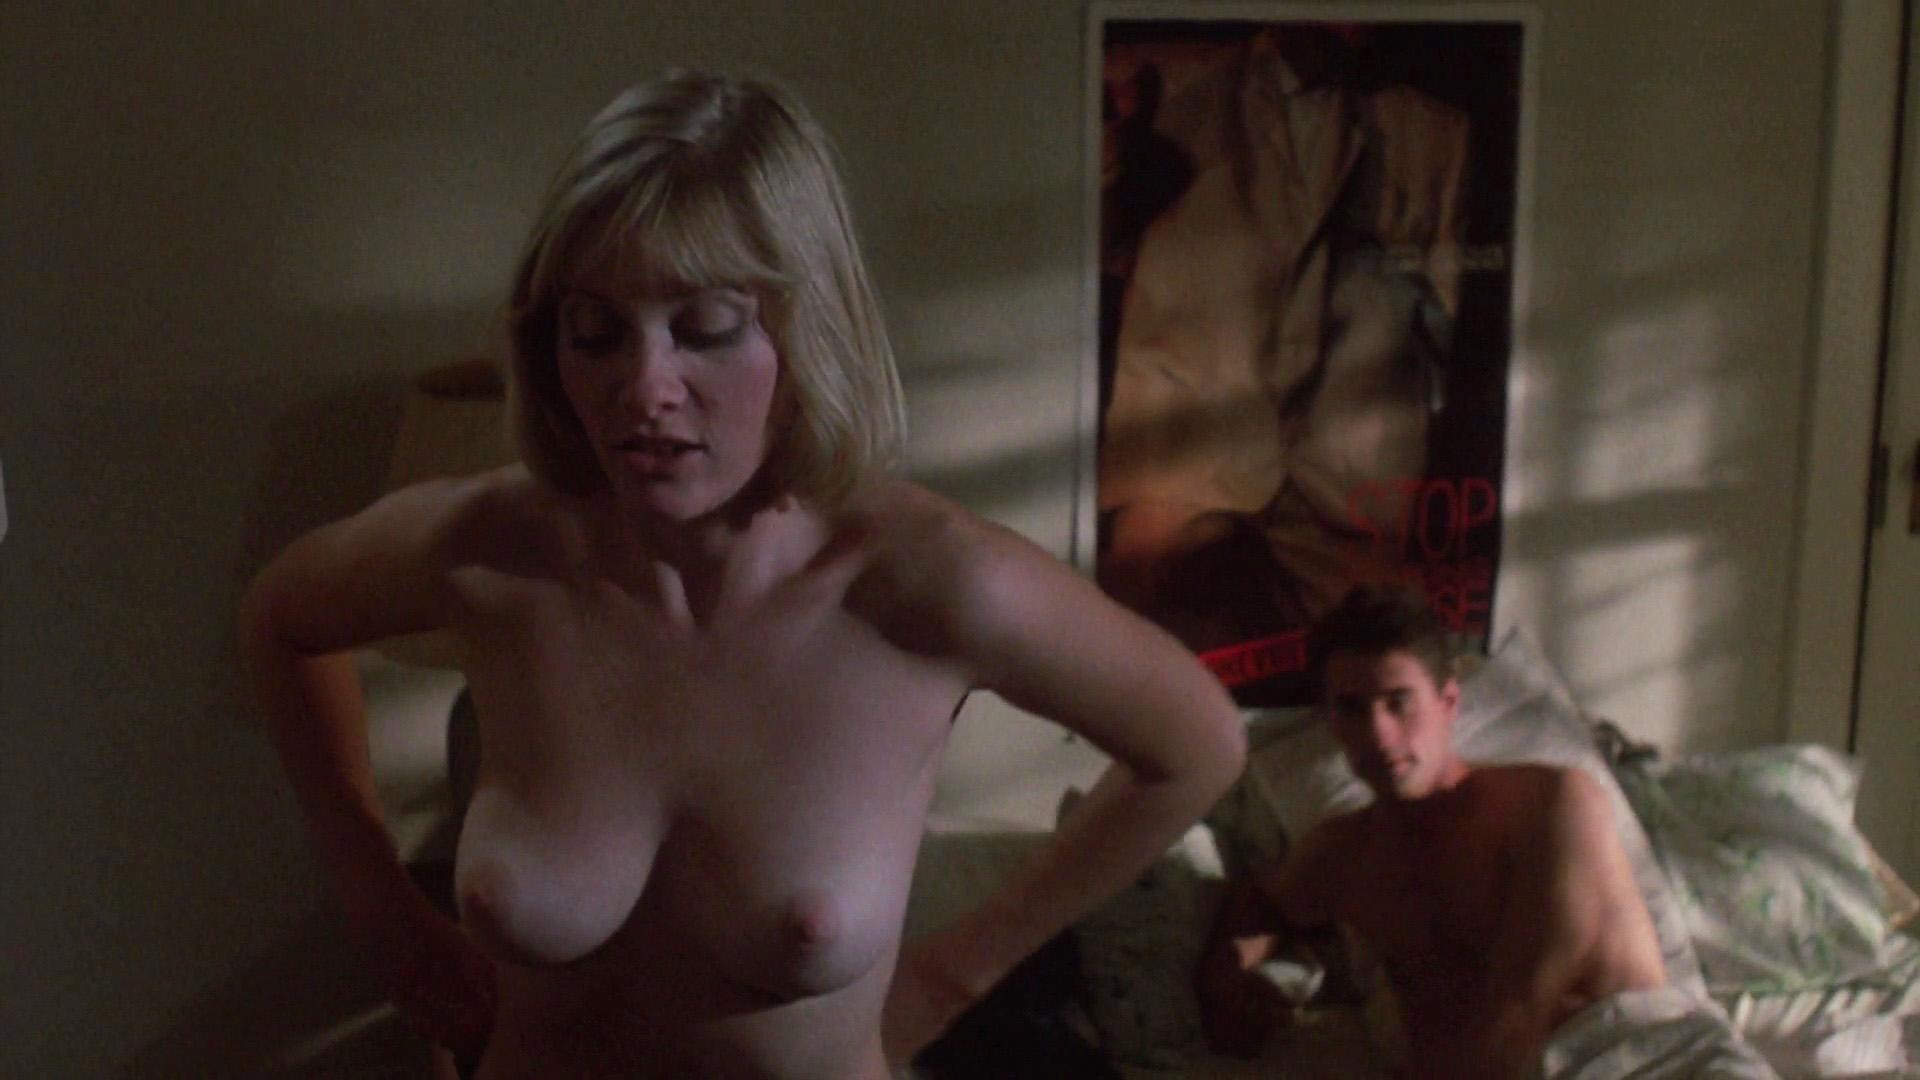 Alyssa Barbara Topless watch online - barbara hershey – the entity (1981) hd 1080p